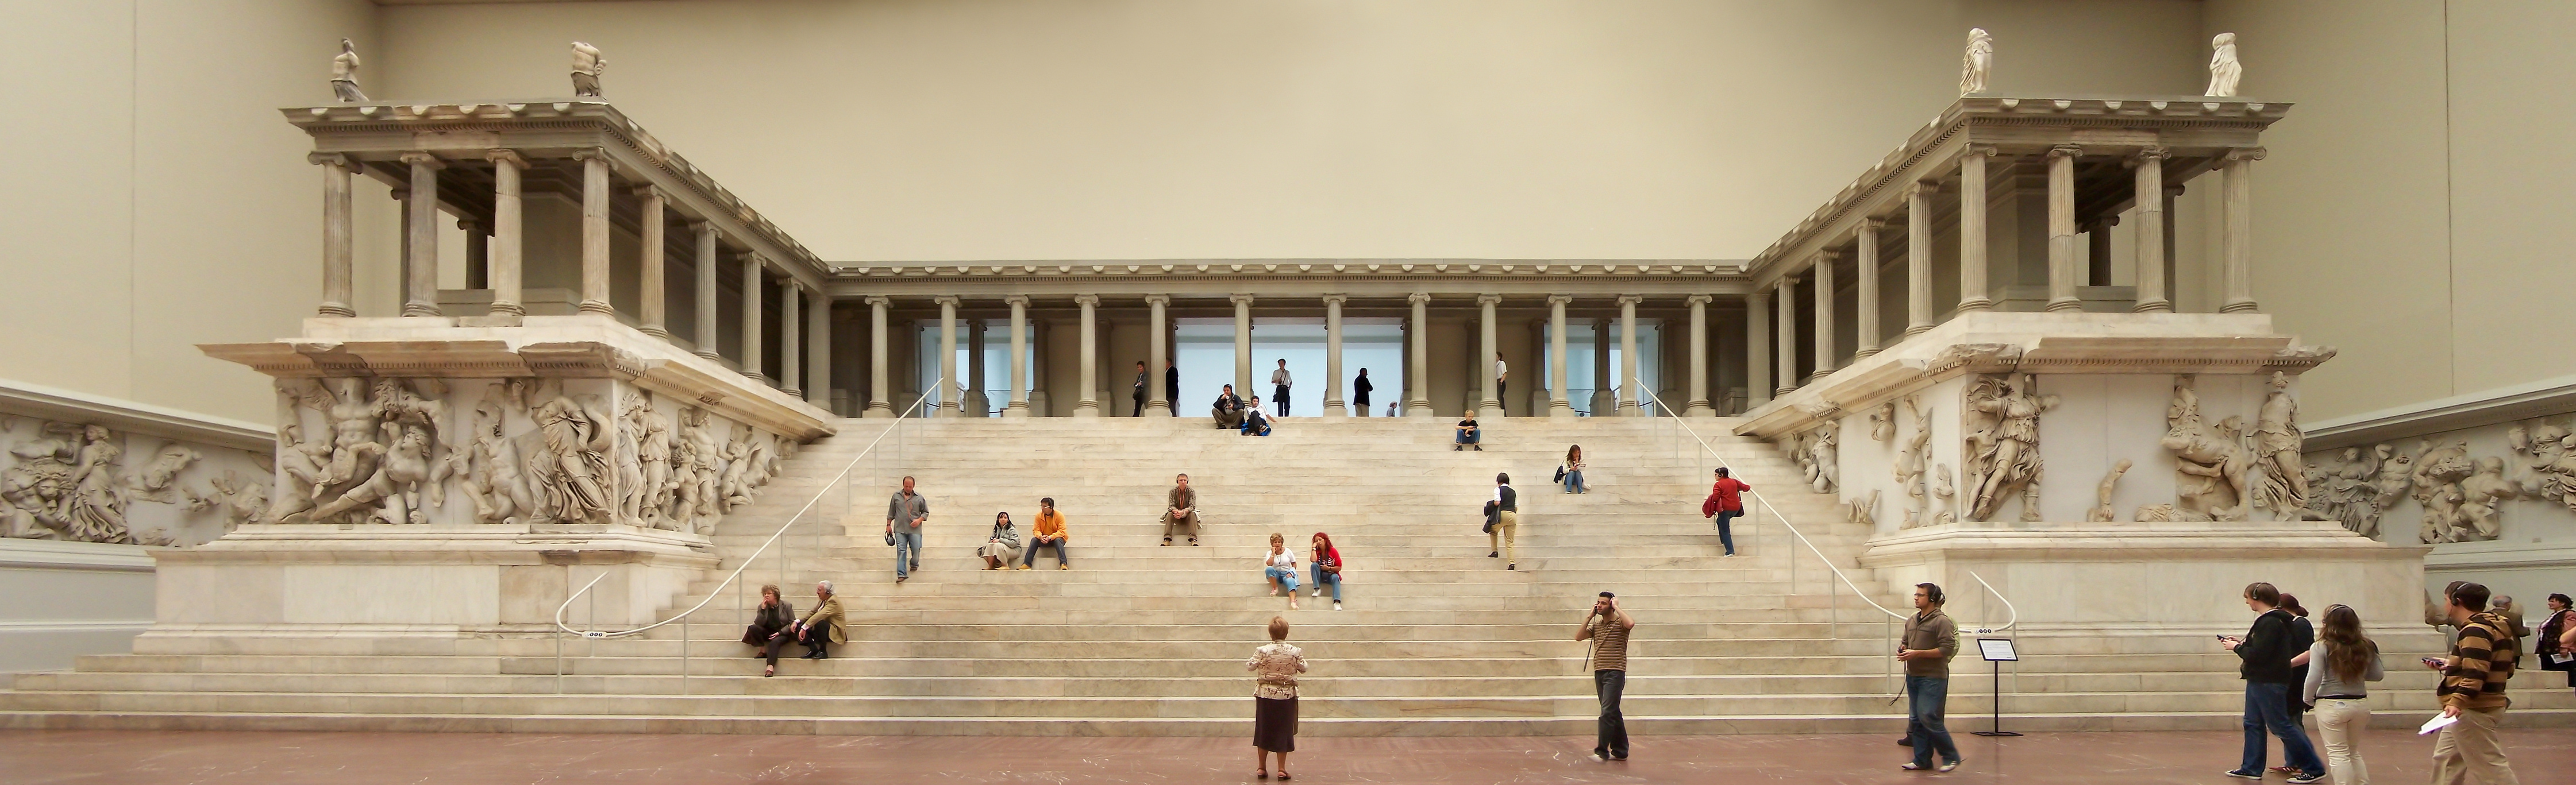 pergamon zeus berlin museum ile ilgili görsel sonucu